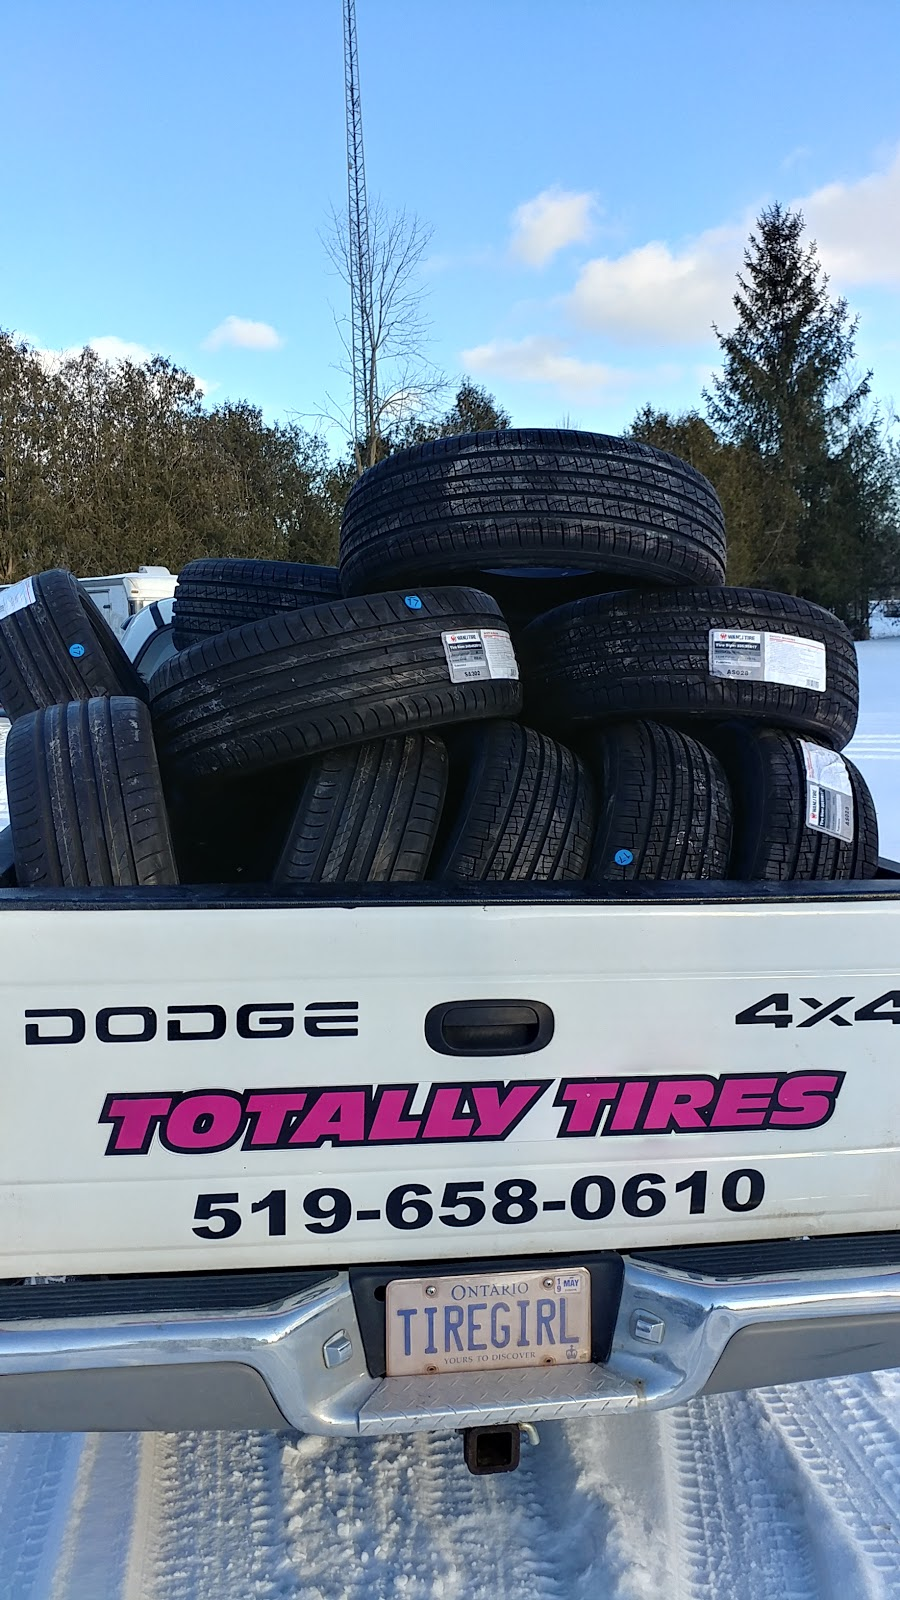 Totally Tires Inc | car repair | 111 Robinson Rd, Cambridge, ON N1R 5S7, Canada | 5196580610 OR +1 519-658-0610